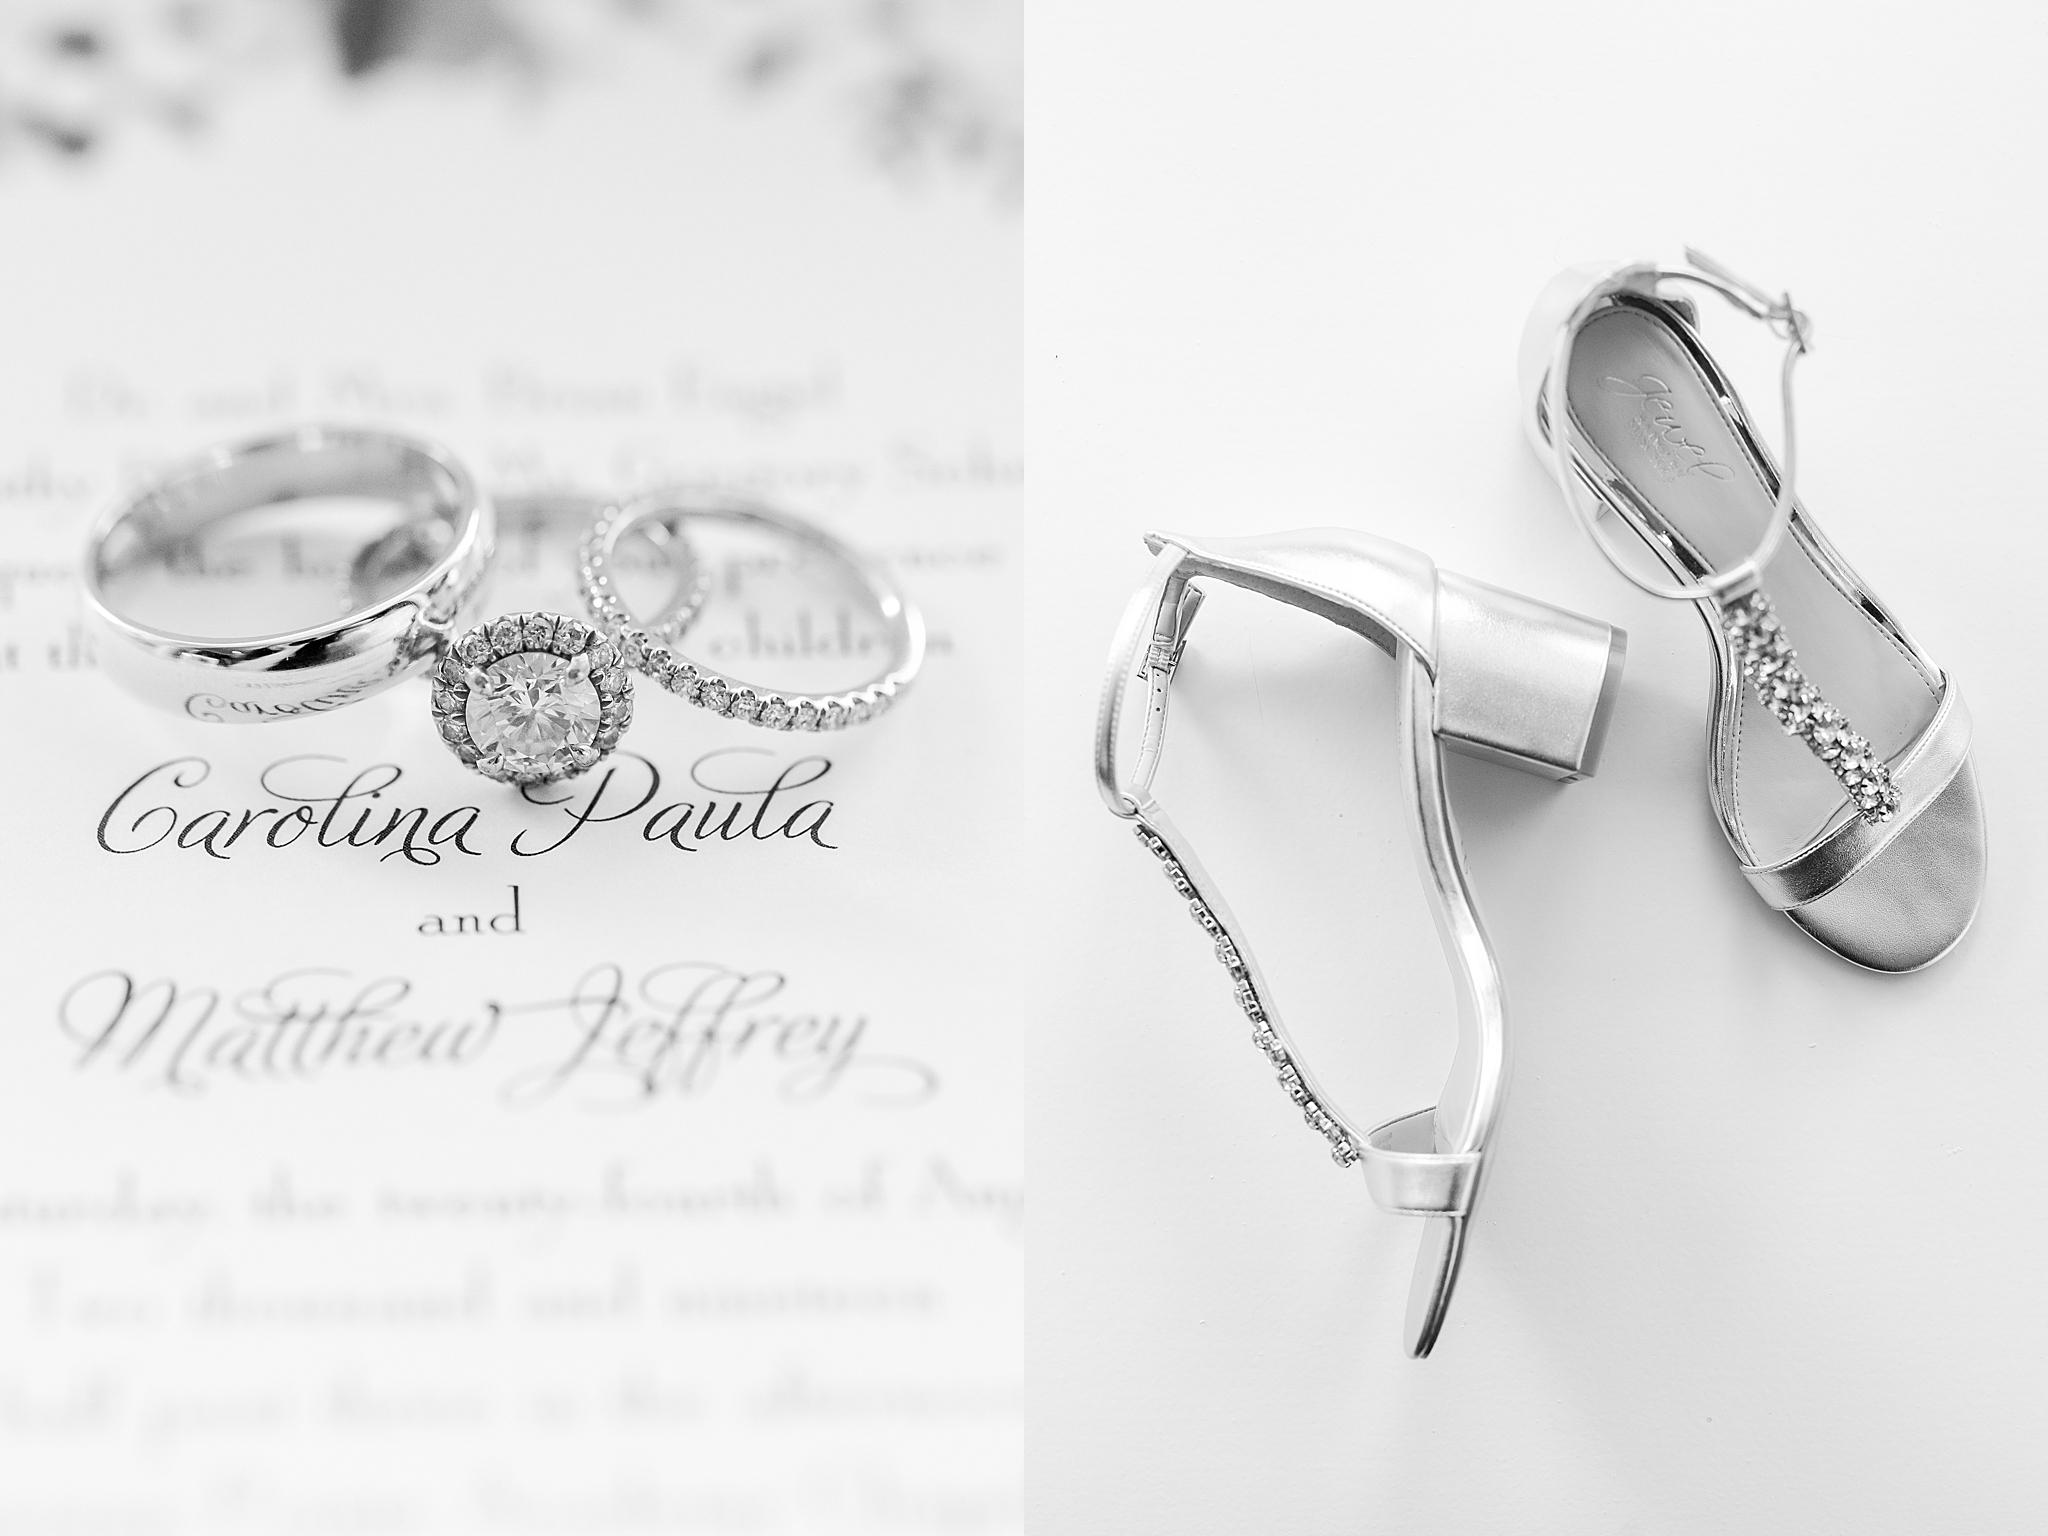 detroit-wedding-photographer-grosse-pointe-academy-chapel-detroit-golf-club-wedding-carly-matt-by-courtney-carolyn-photography_0012.jpg